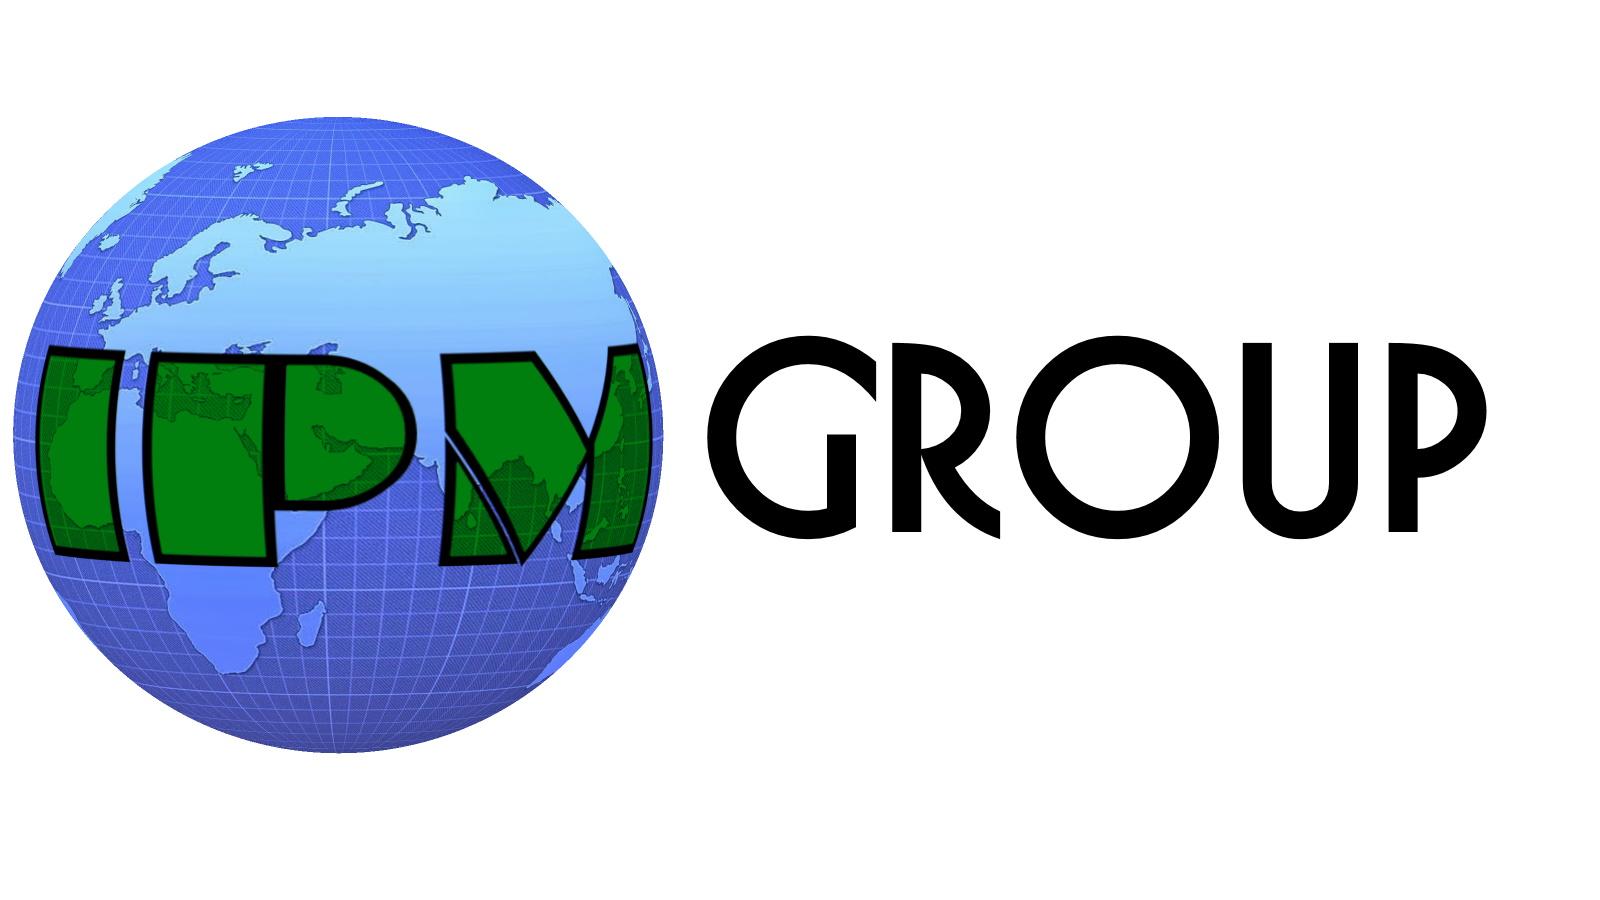 Разработка логотипа для управляющей компании фото f_6405f8423386dd62.jpg